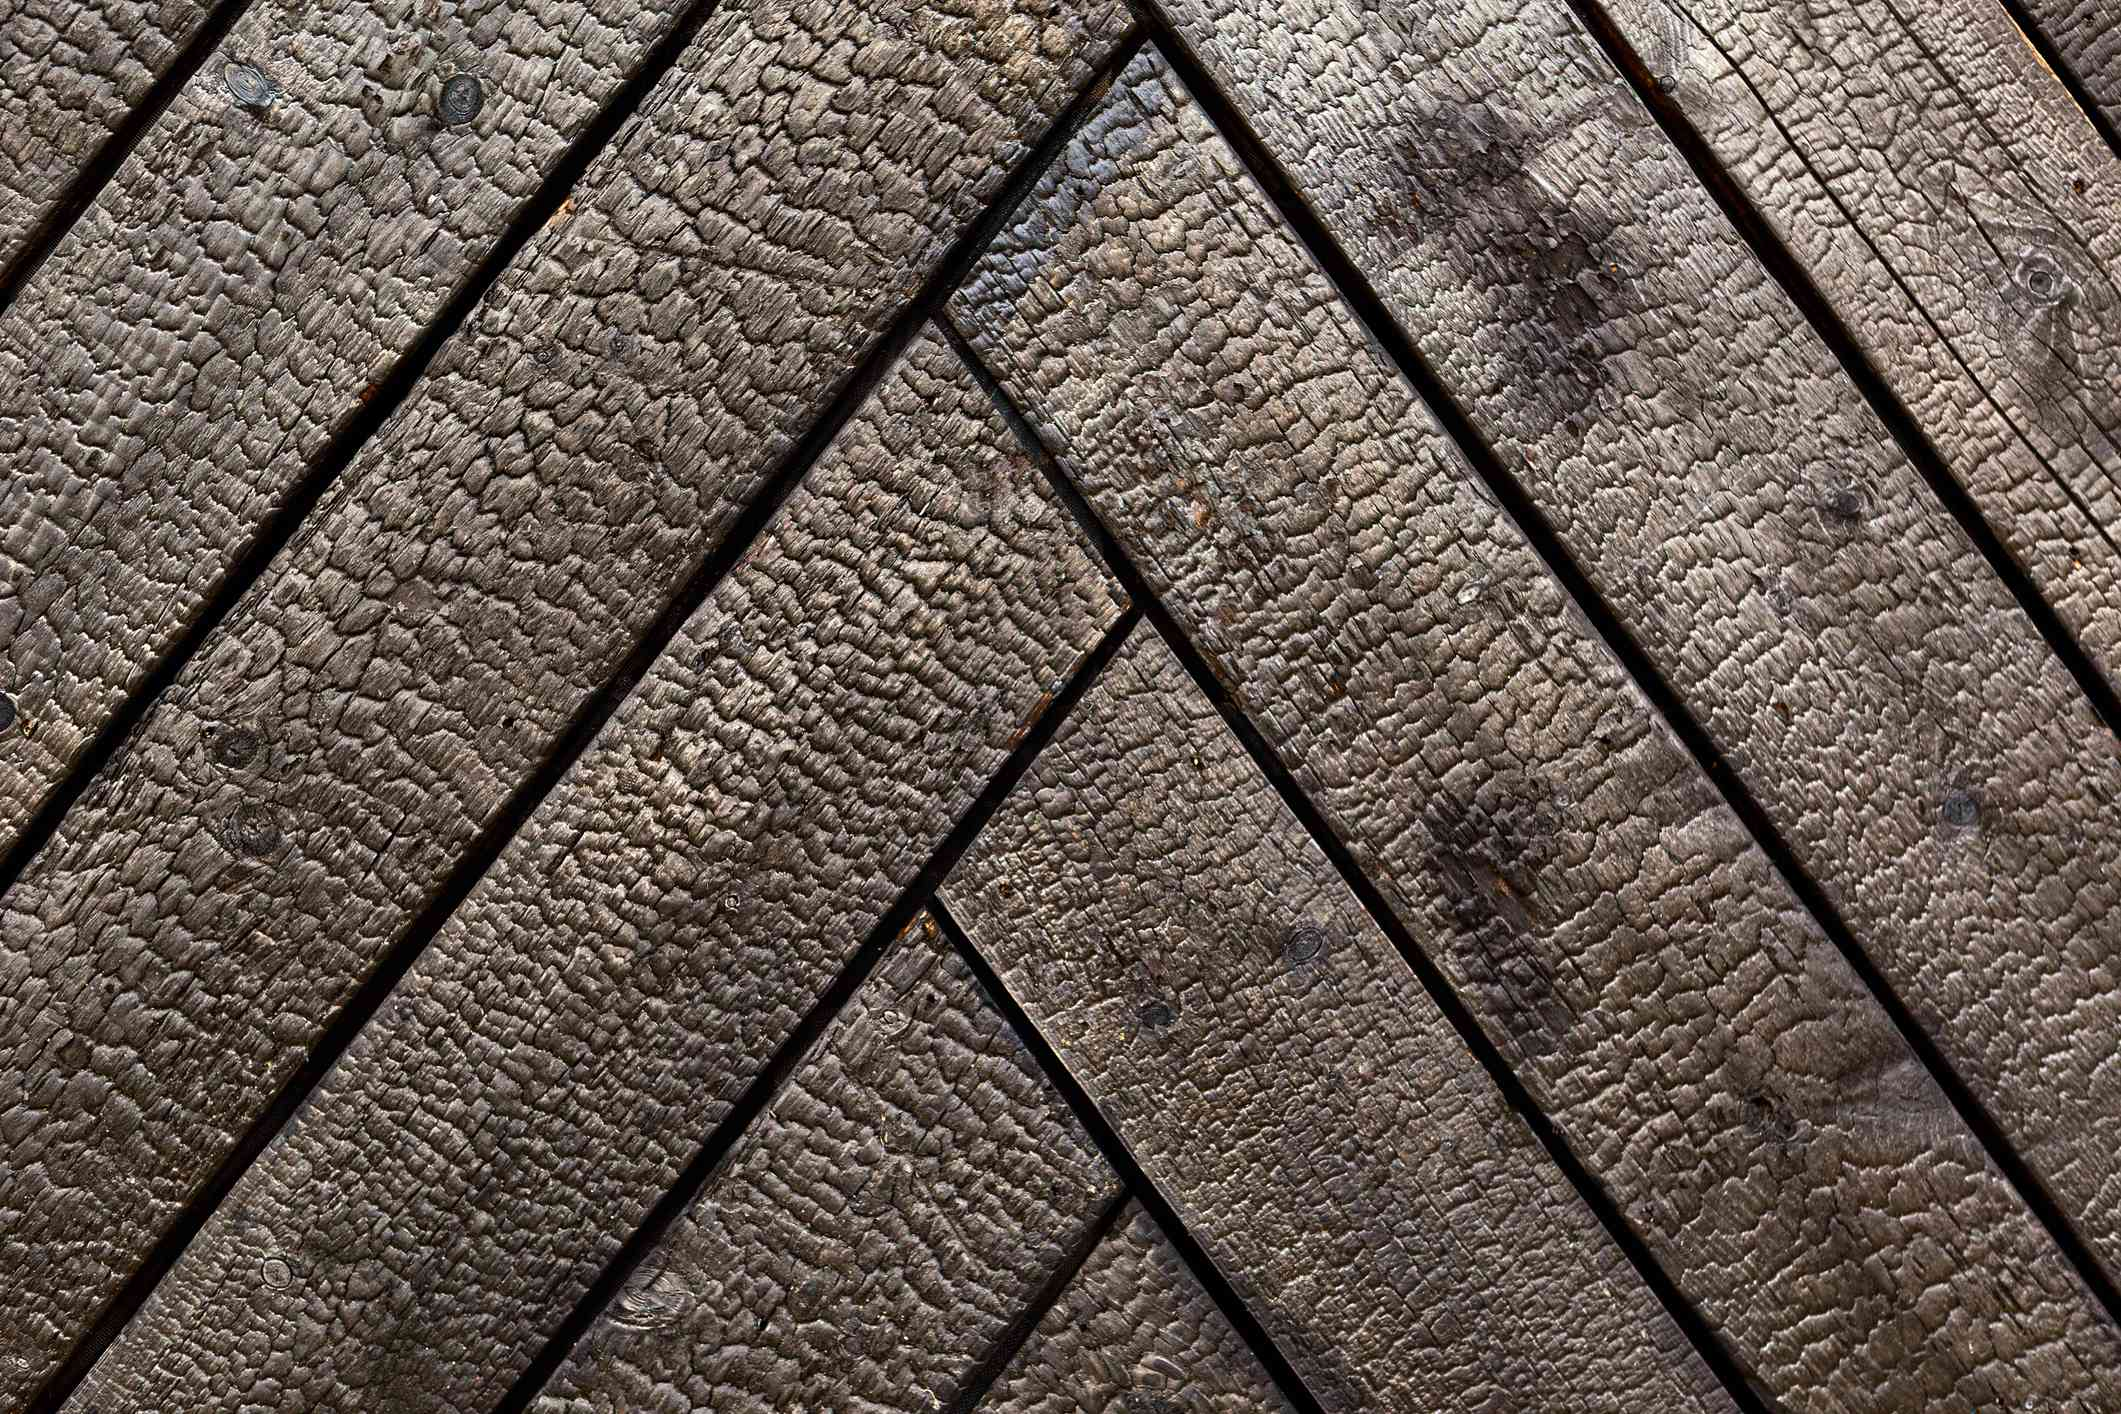 Burned cedar wood close-up